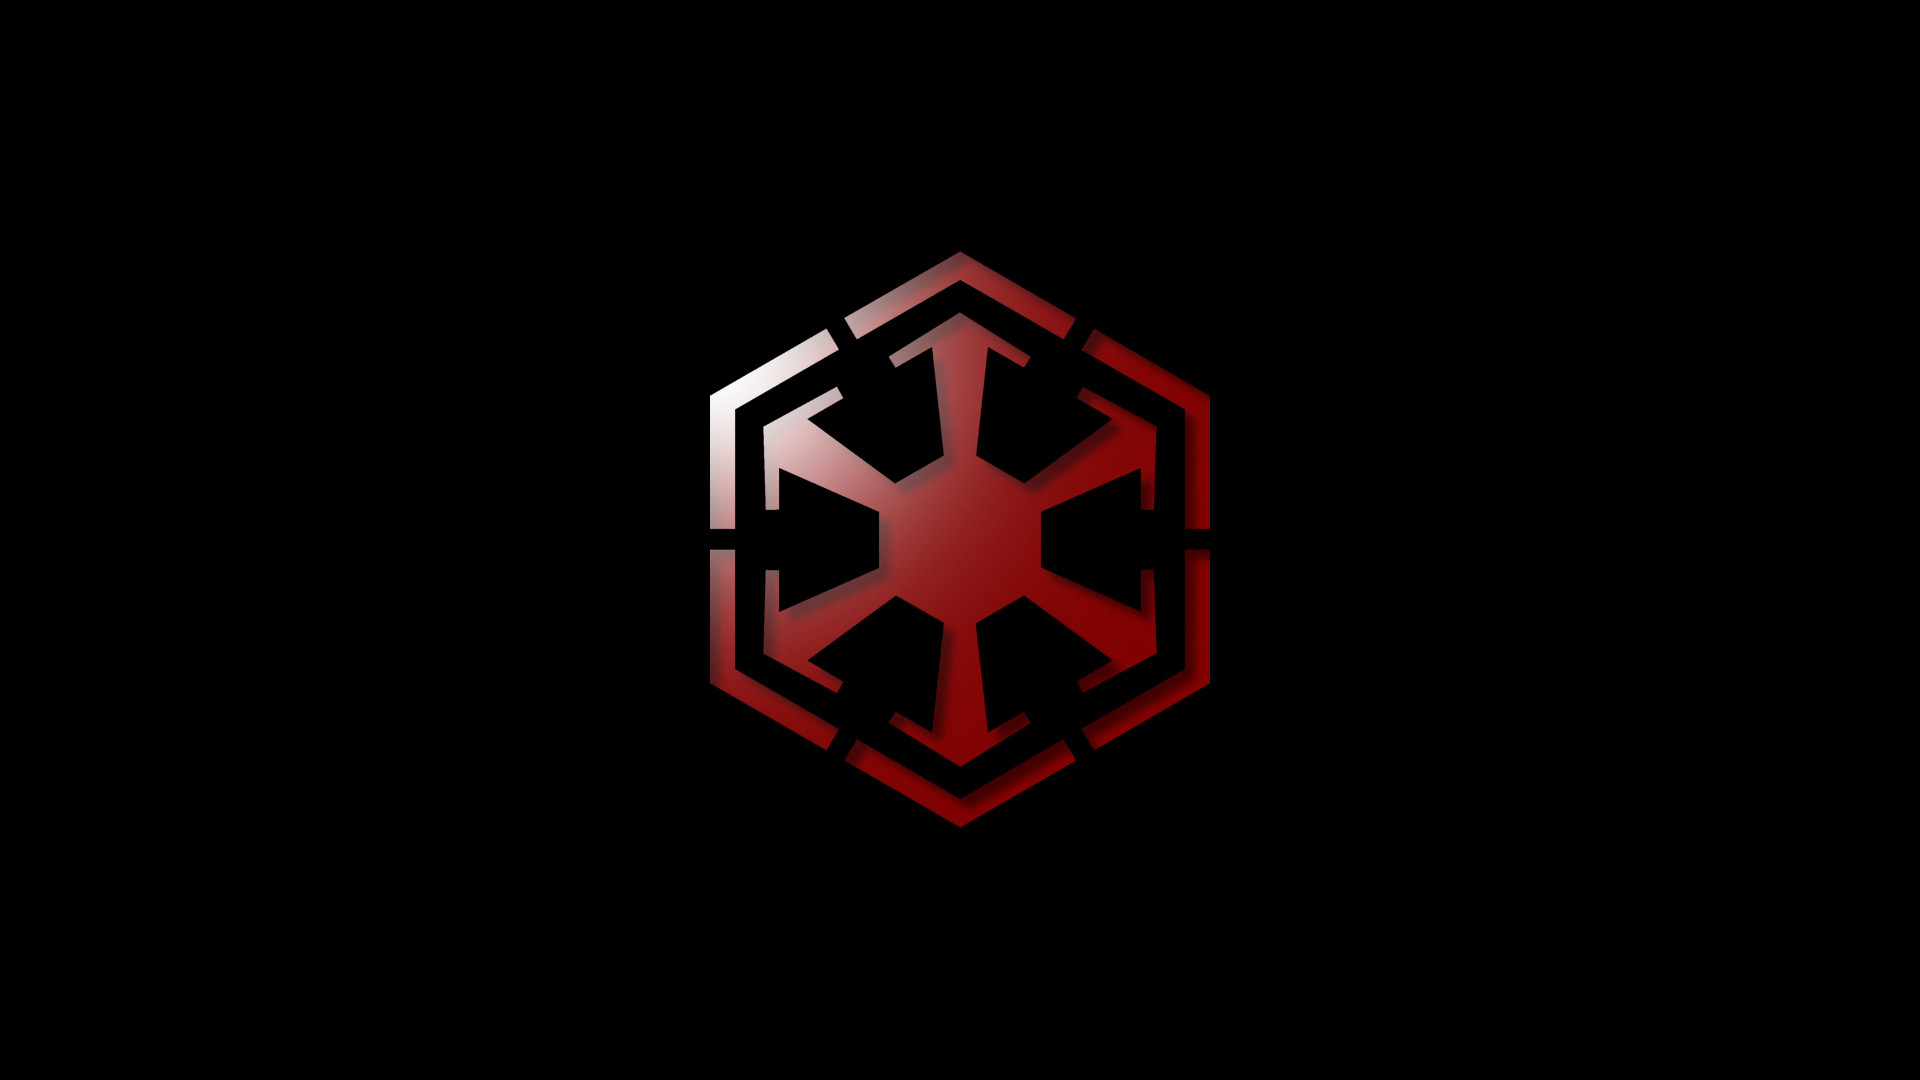 The Simple SWTOR Sith Wallpaper by DistantWanderer on DeviantArt